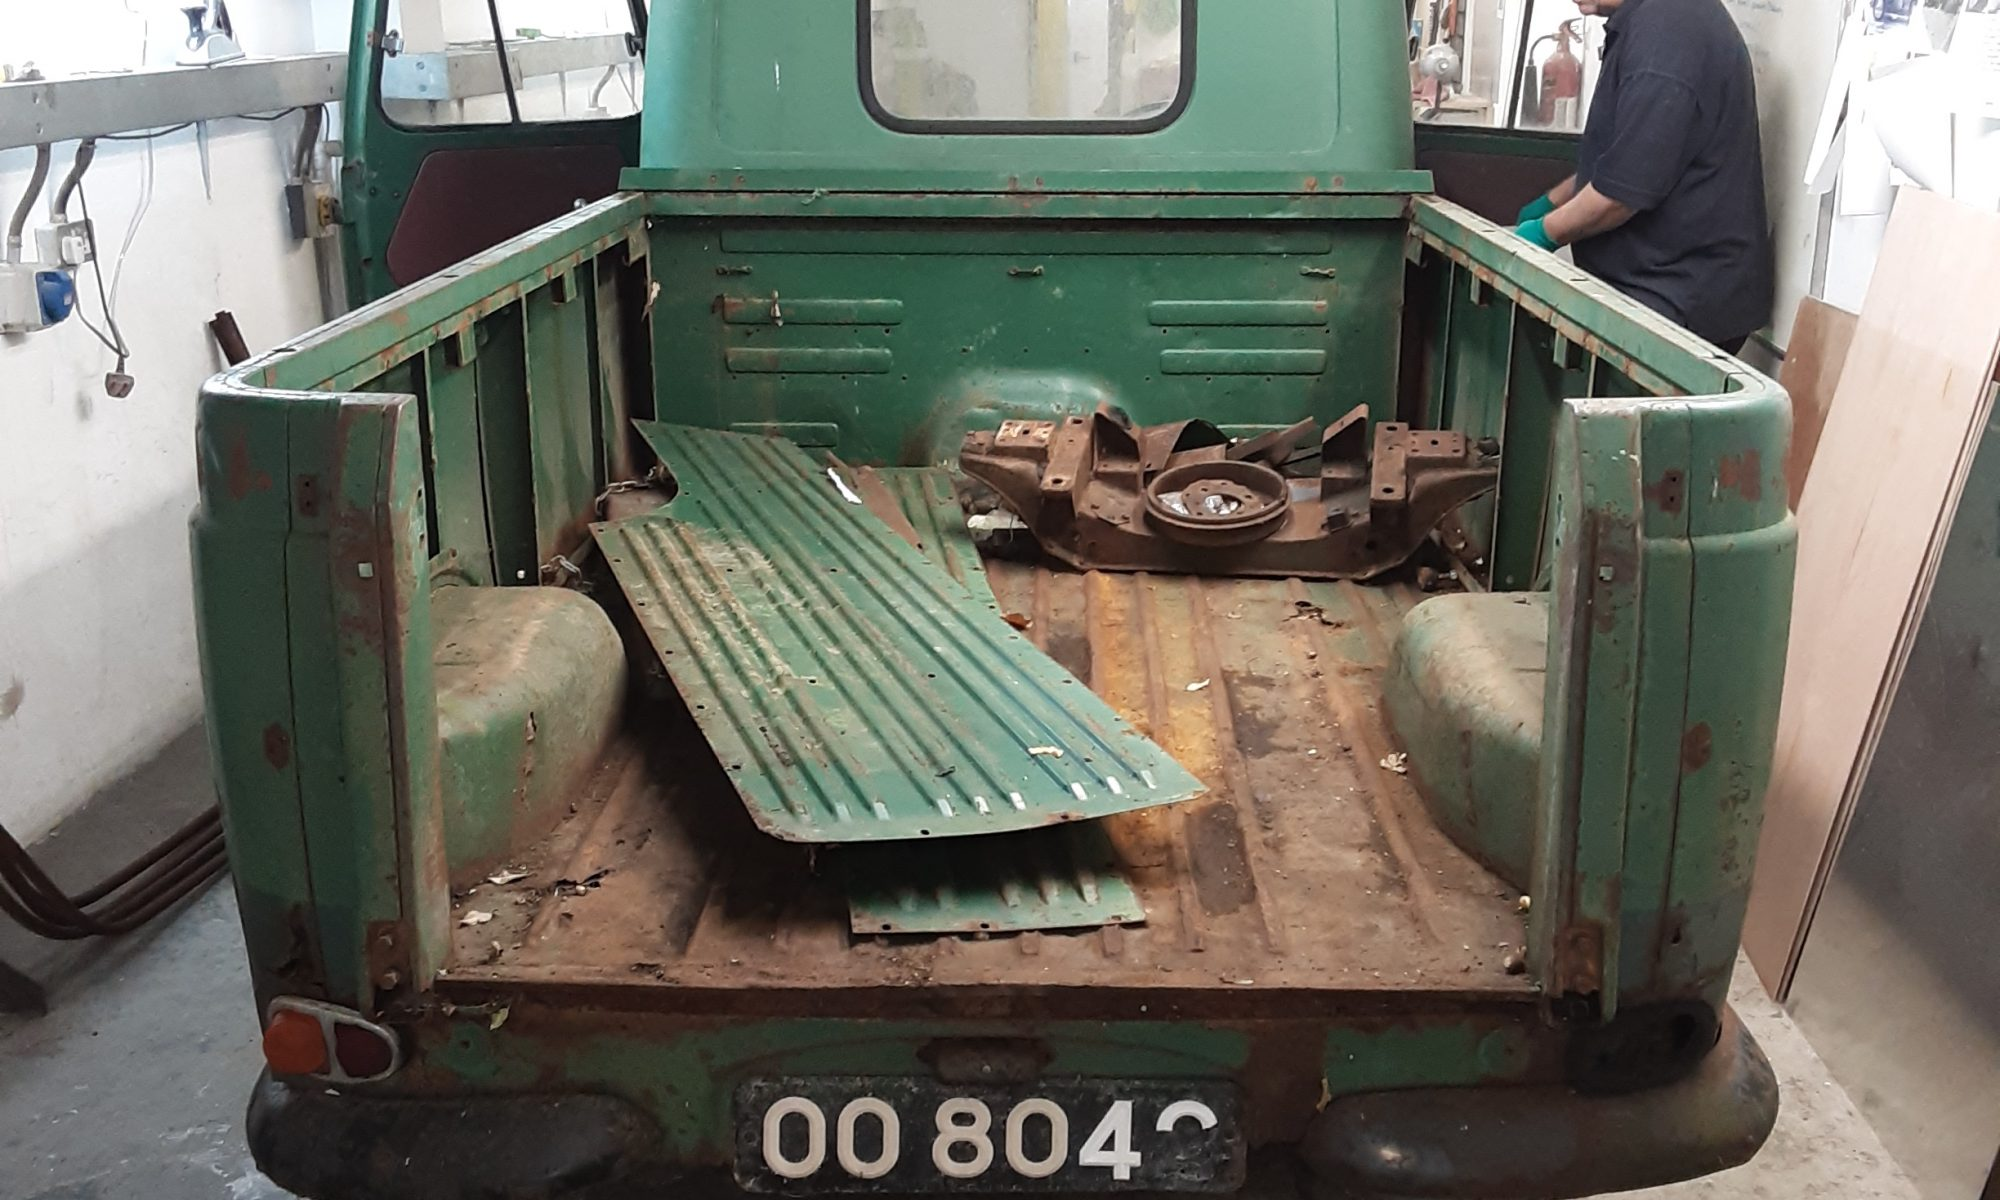 Morris J4 pickup restoration